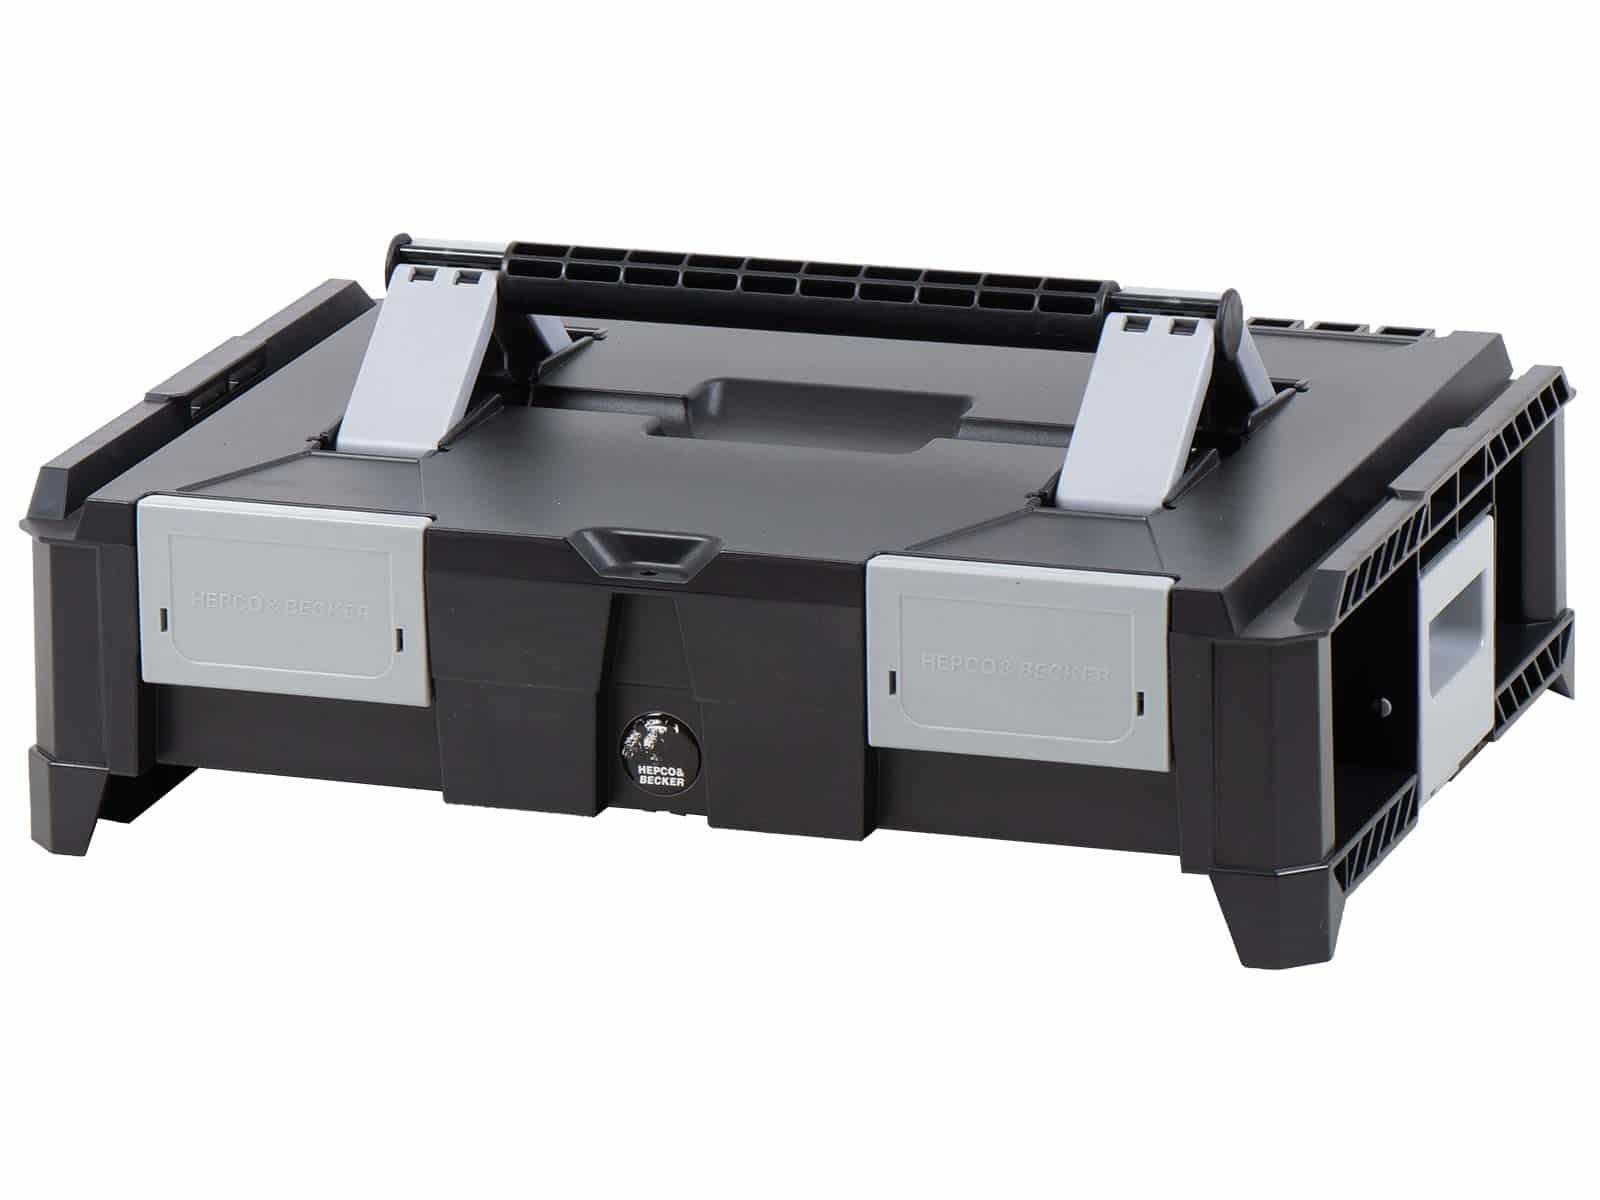 Skybox Werkzeugbox S